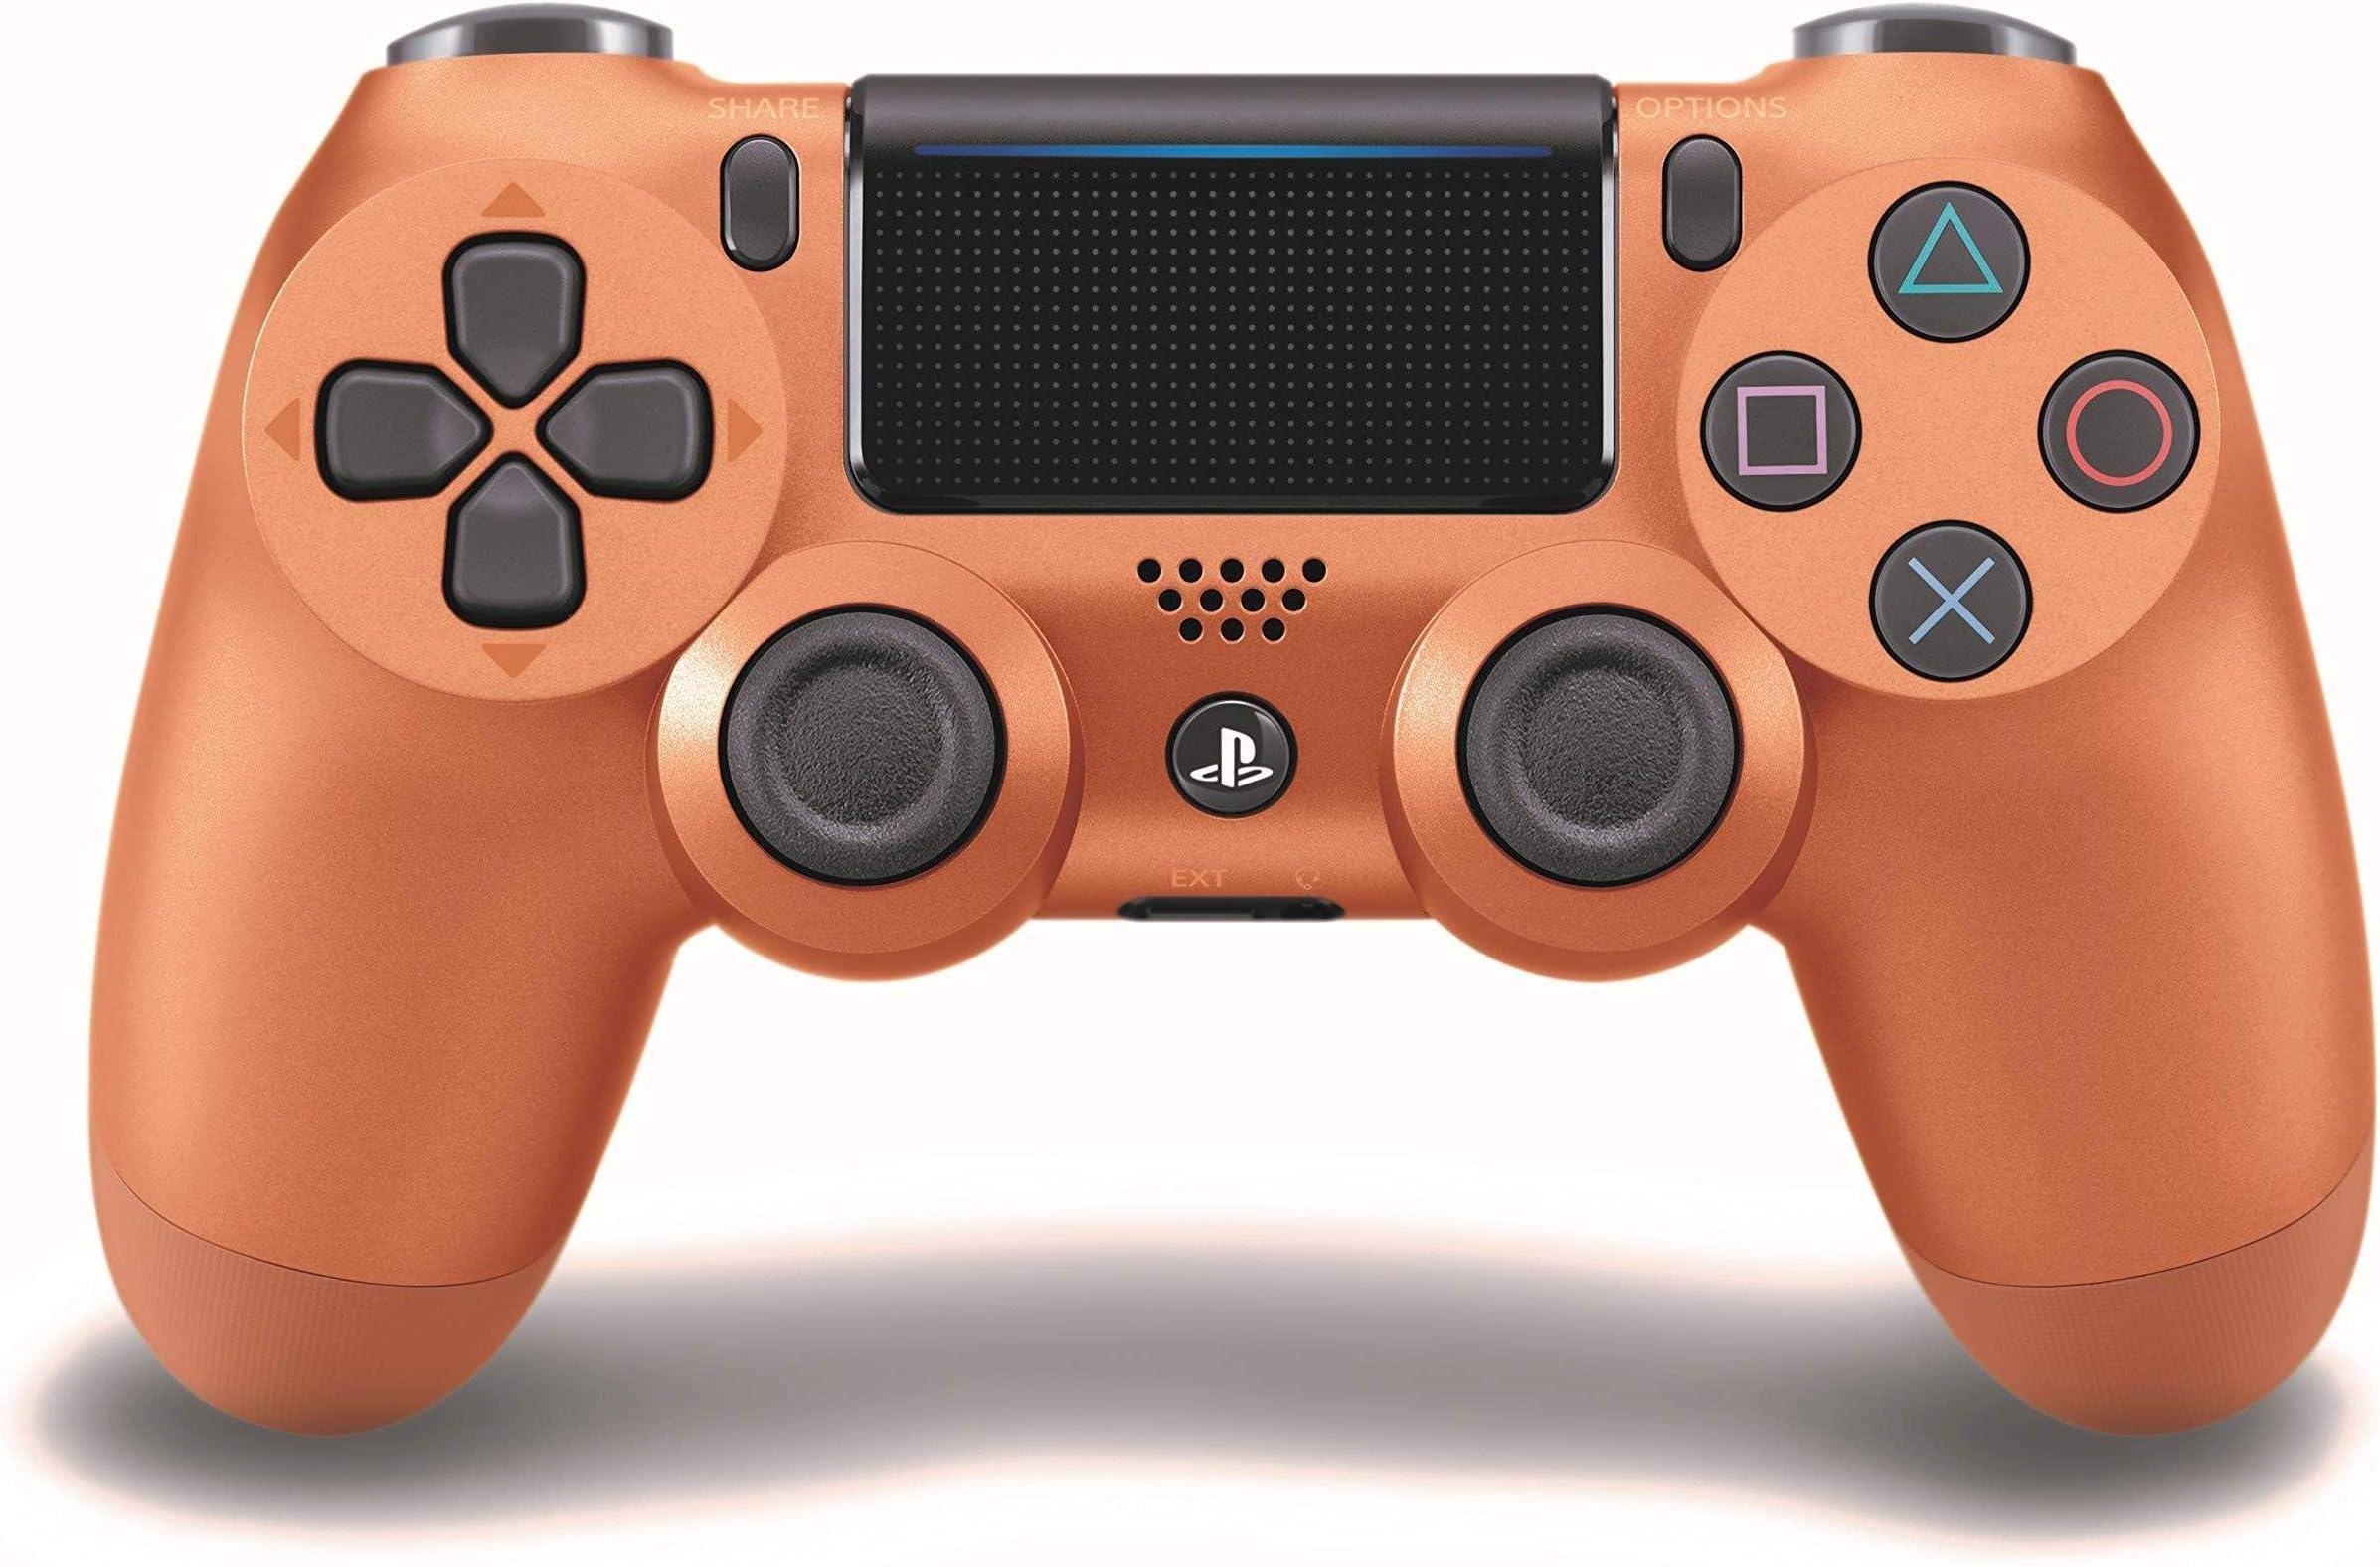 Amazon.com: DualShock 4 - Mando inalámbrico (cobre metálico ...